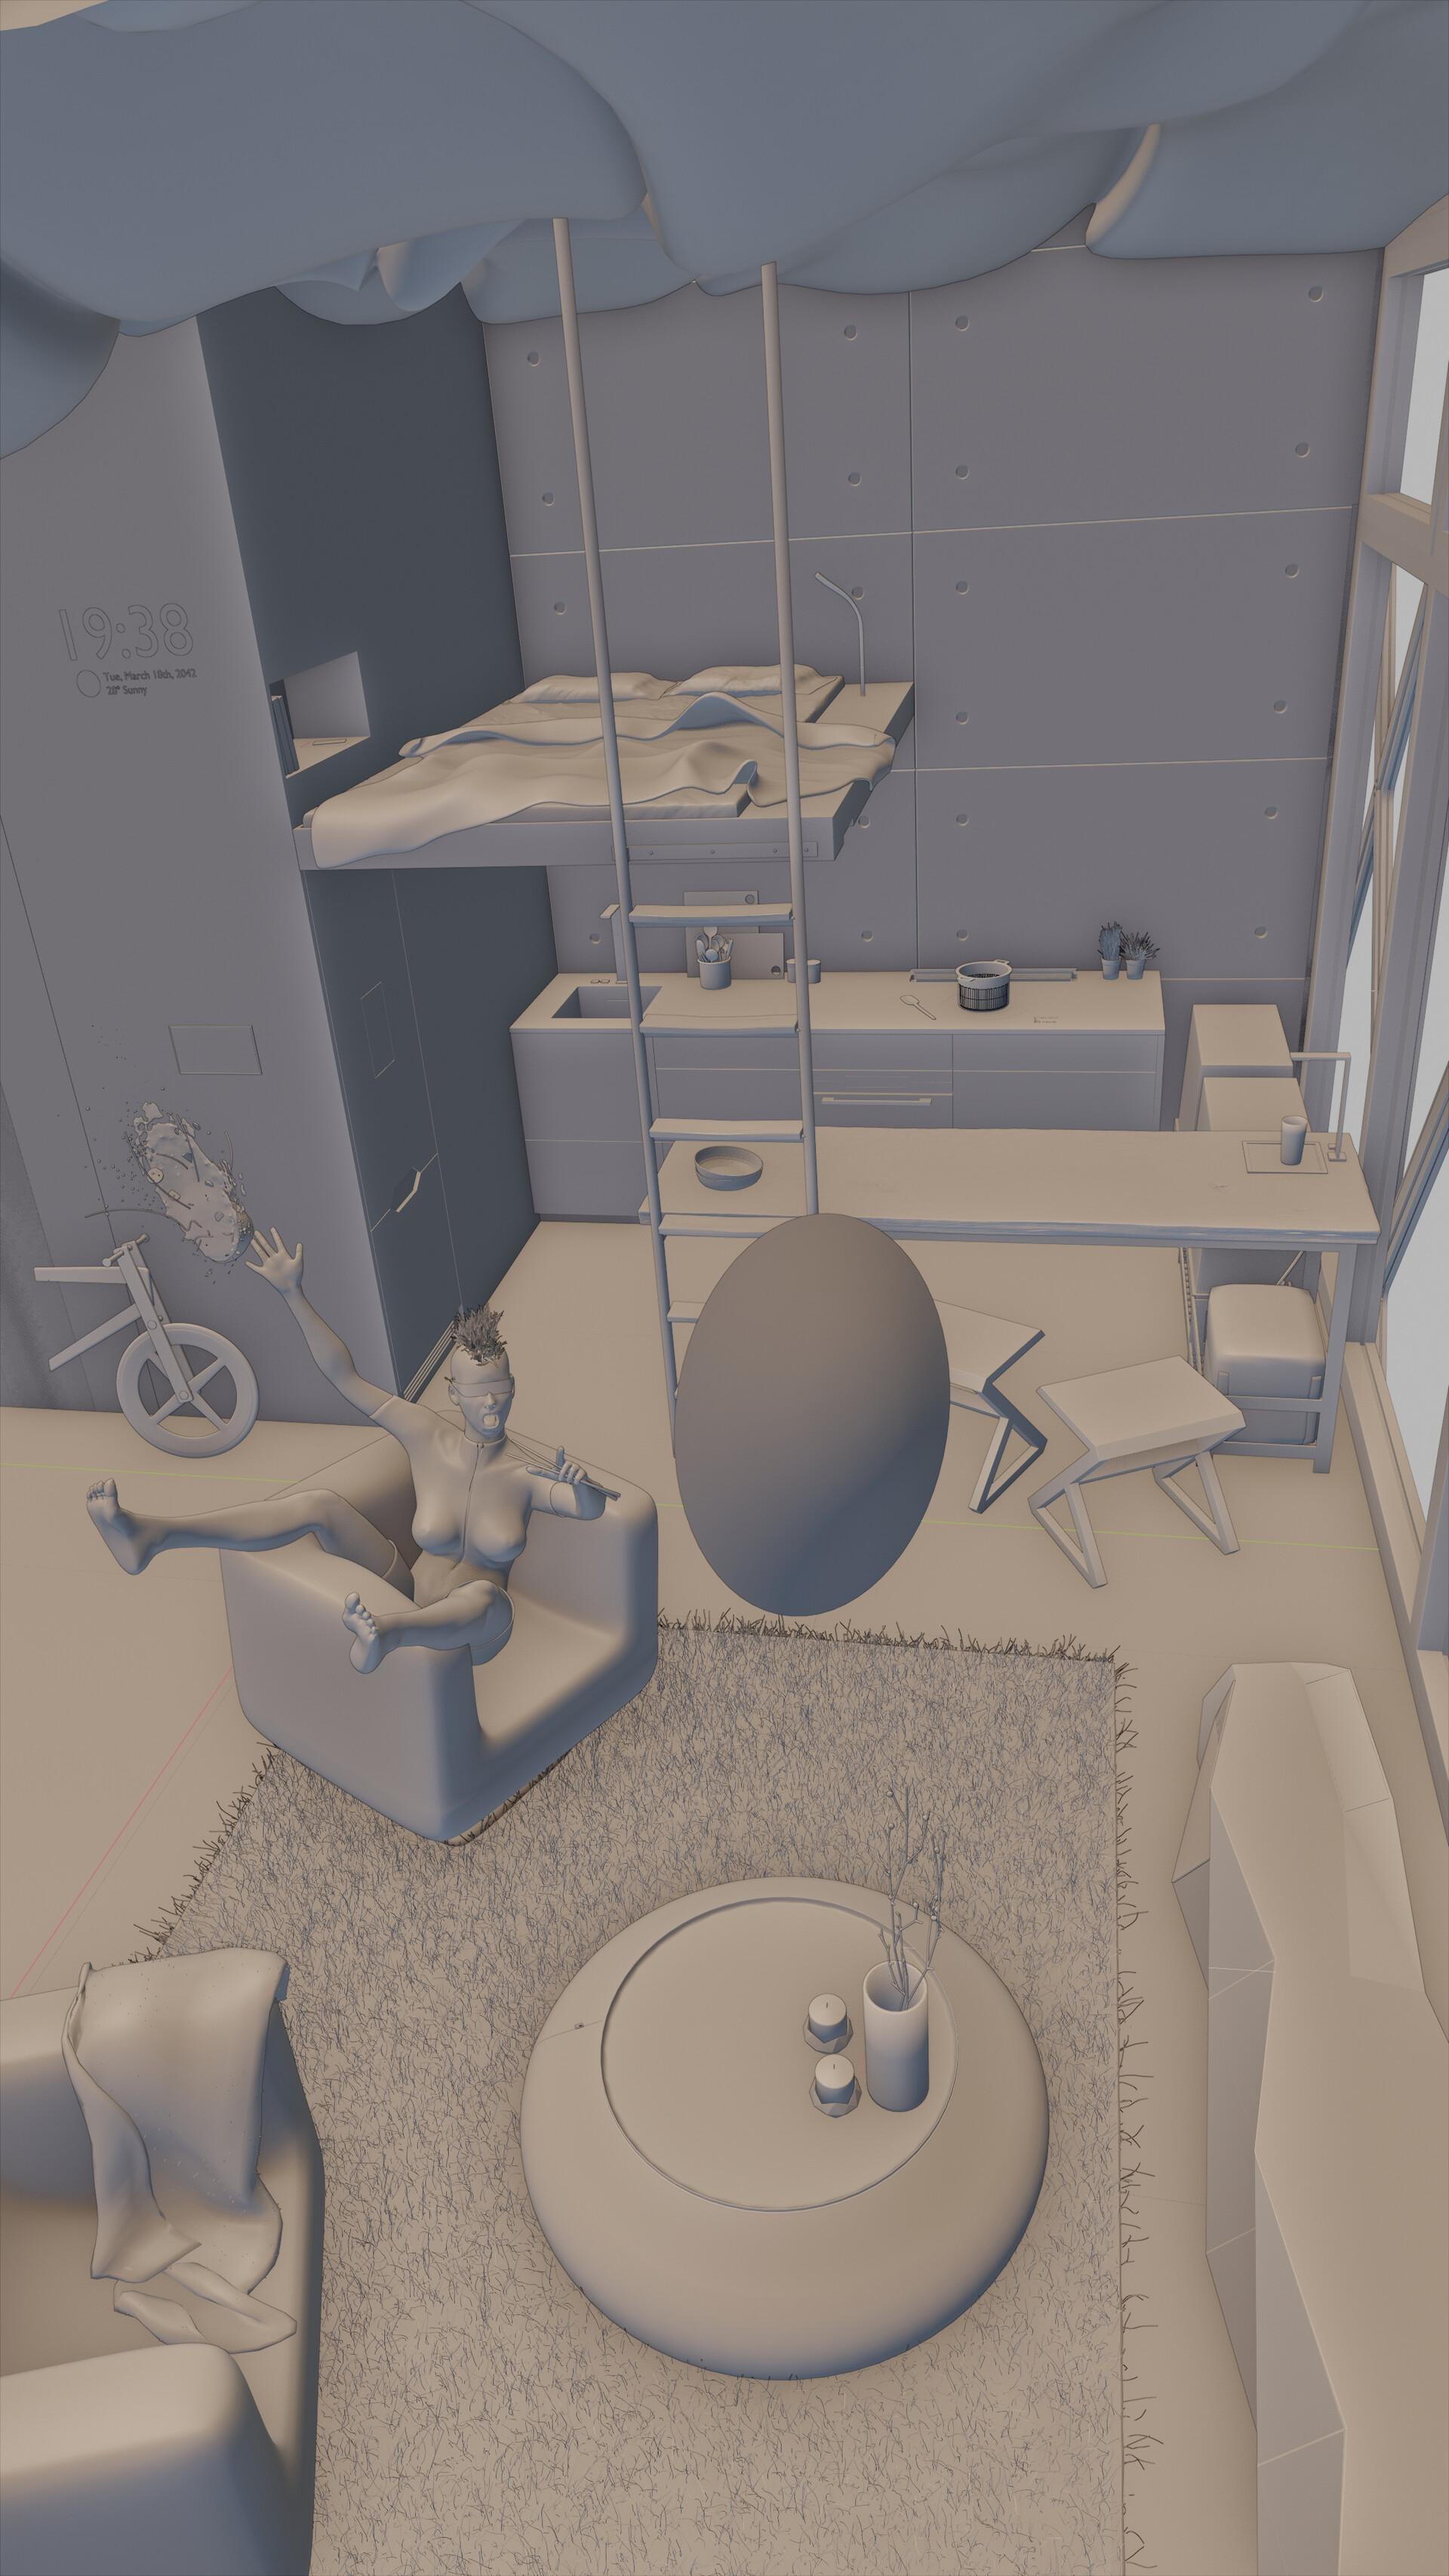 ArtStation - Marc Iglesias's submission on NVIDIA Metropia